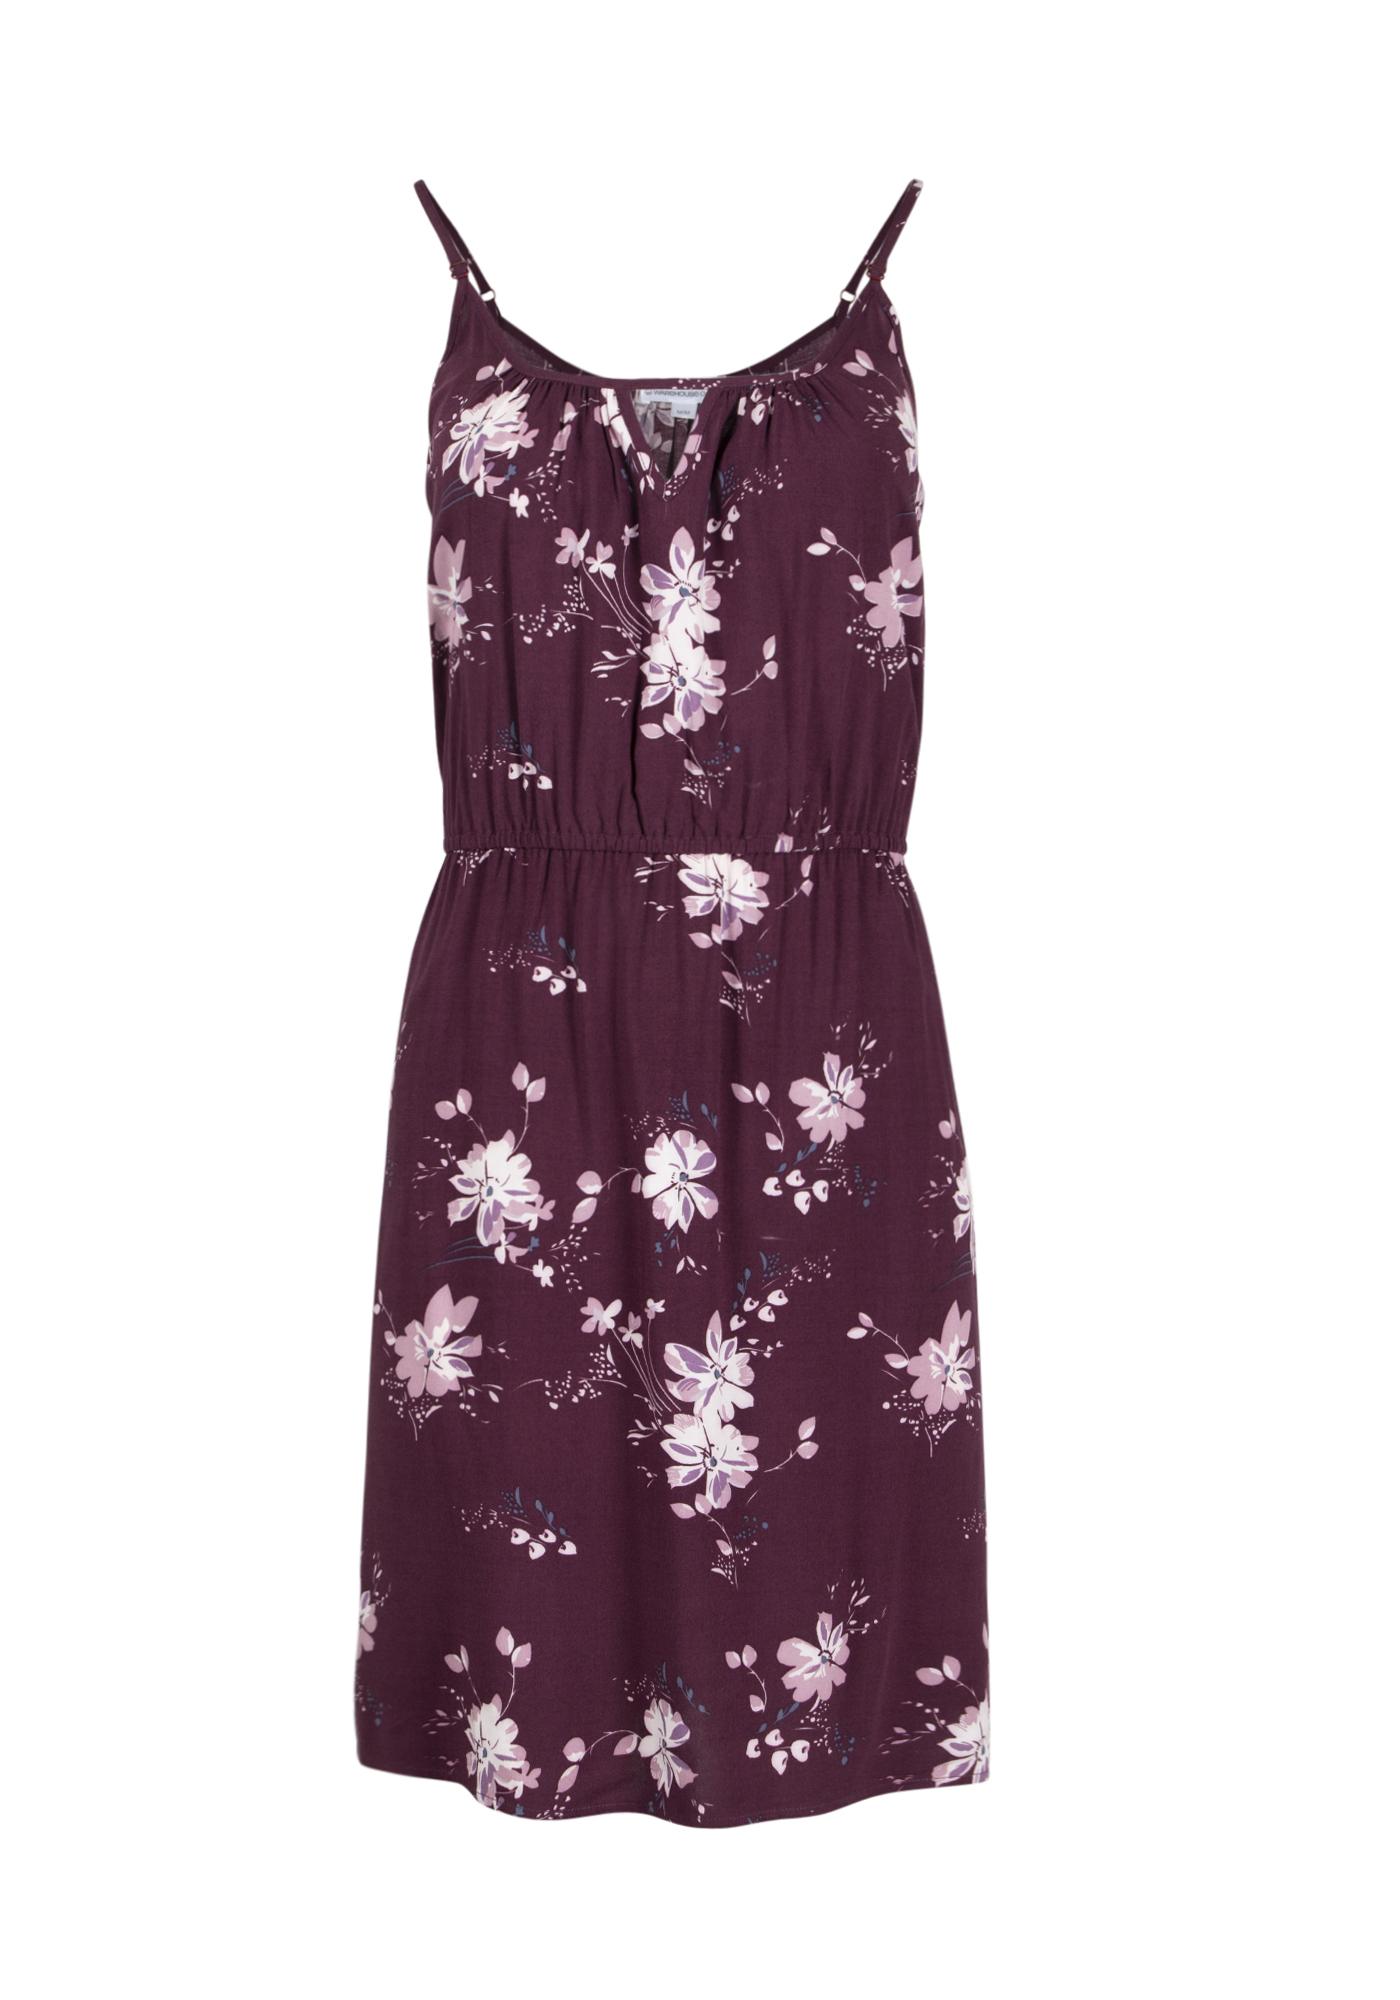 Women's Floral Keyhole Dress